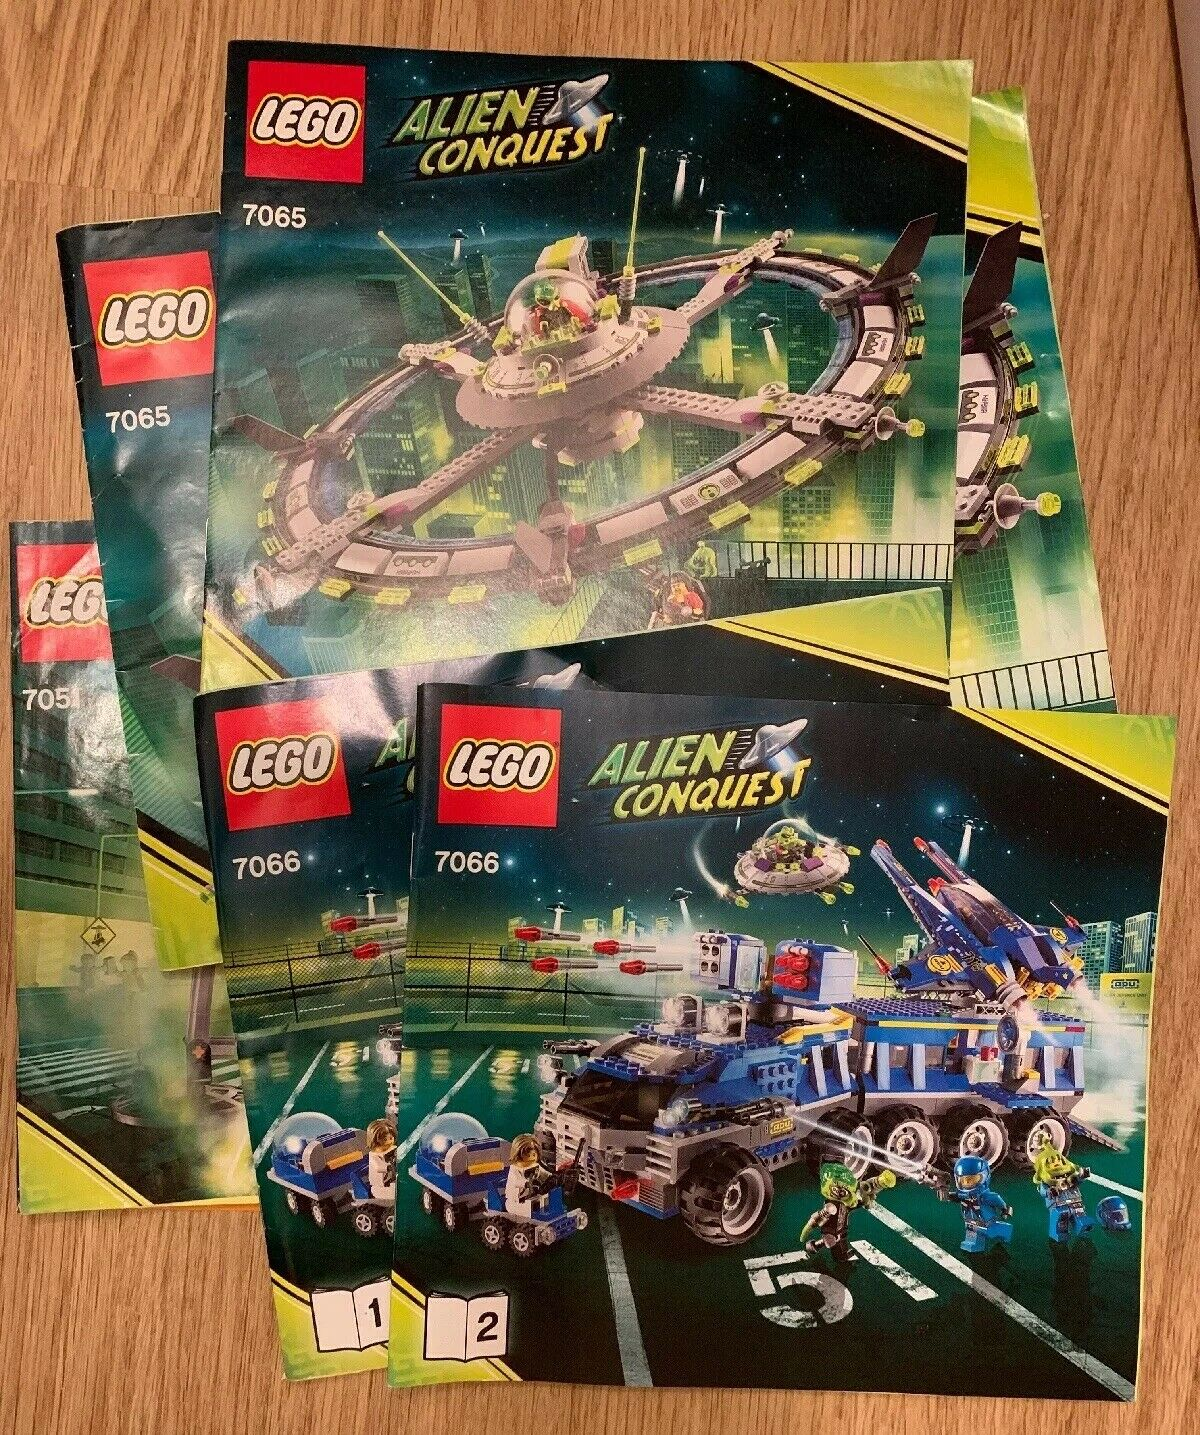 presa LEGO ALIEN conqest Set Set Set Collezione 7065 7066  alta qualità generale